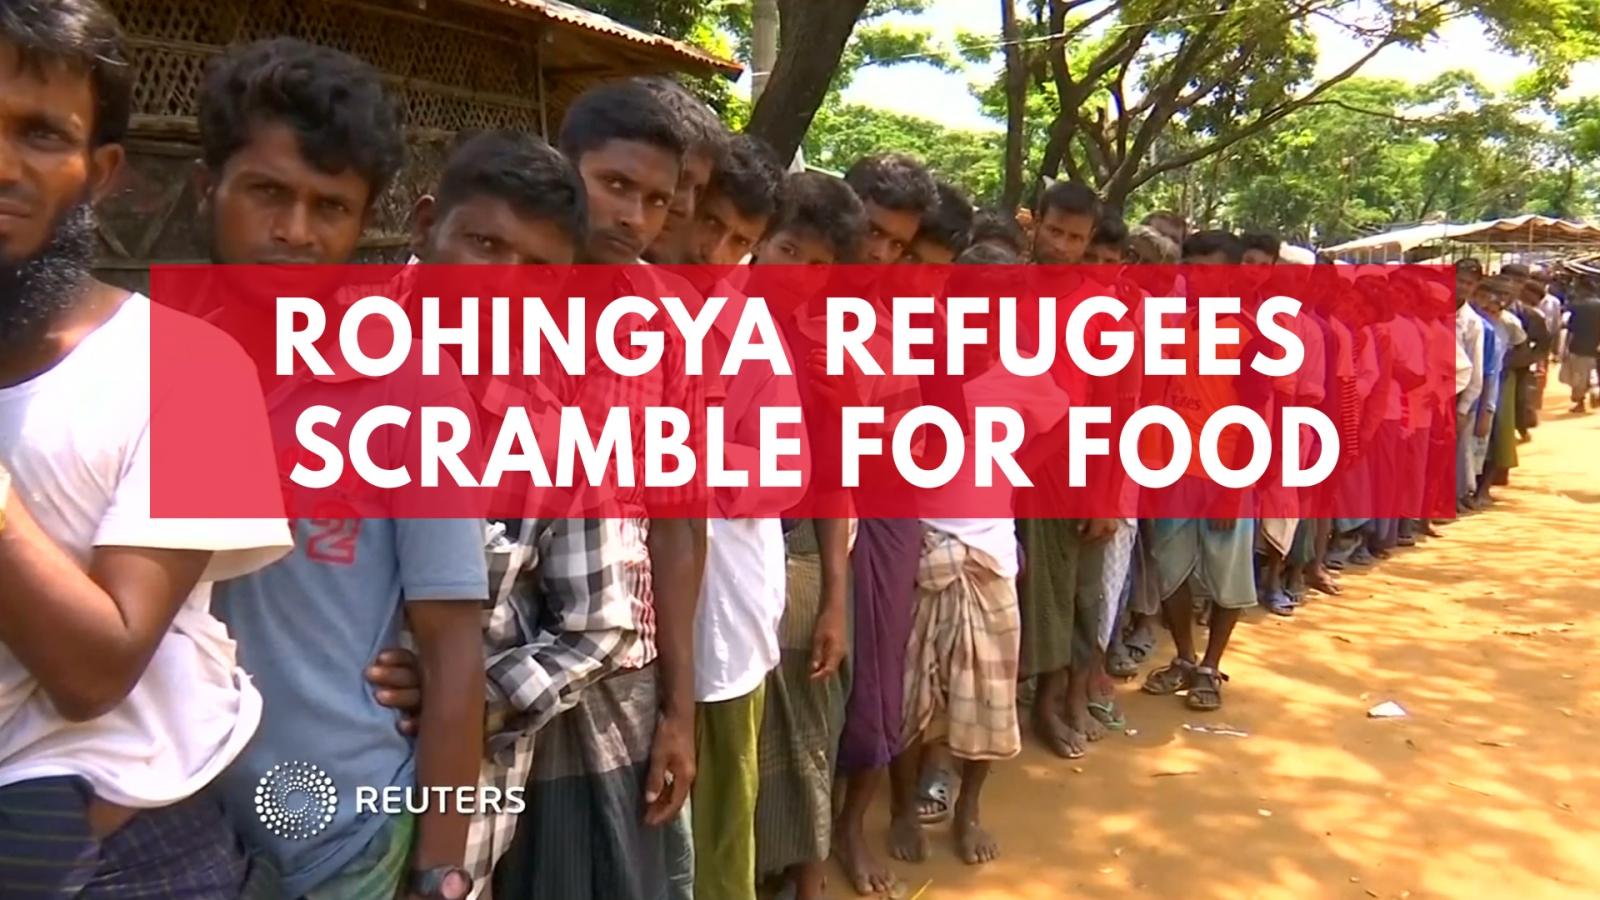 rohingya-refugees-in-bangladesh-scramble-for-food